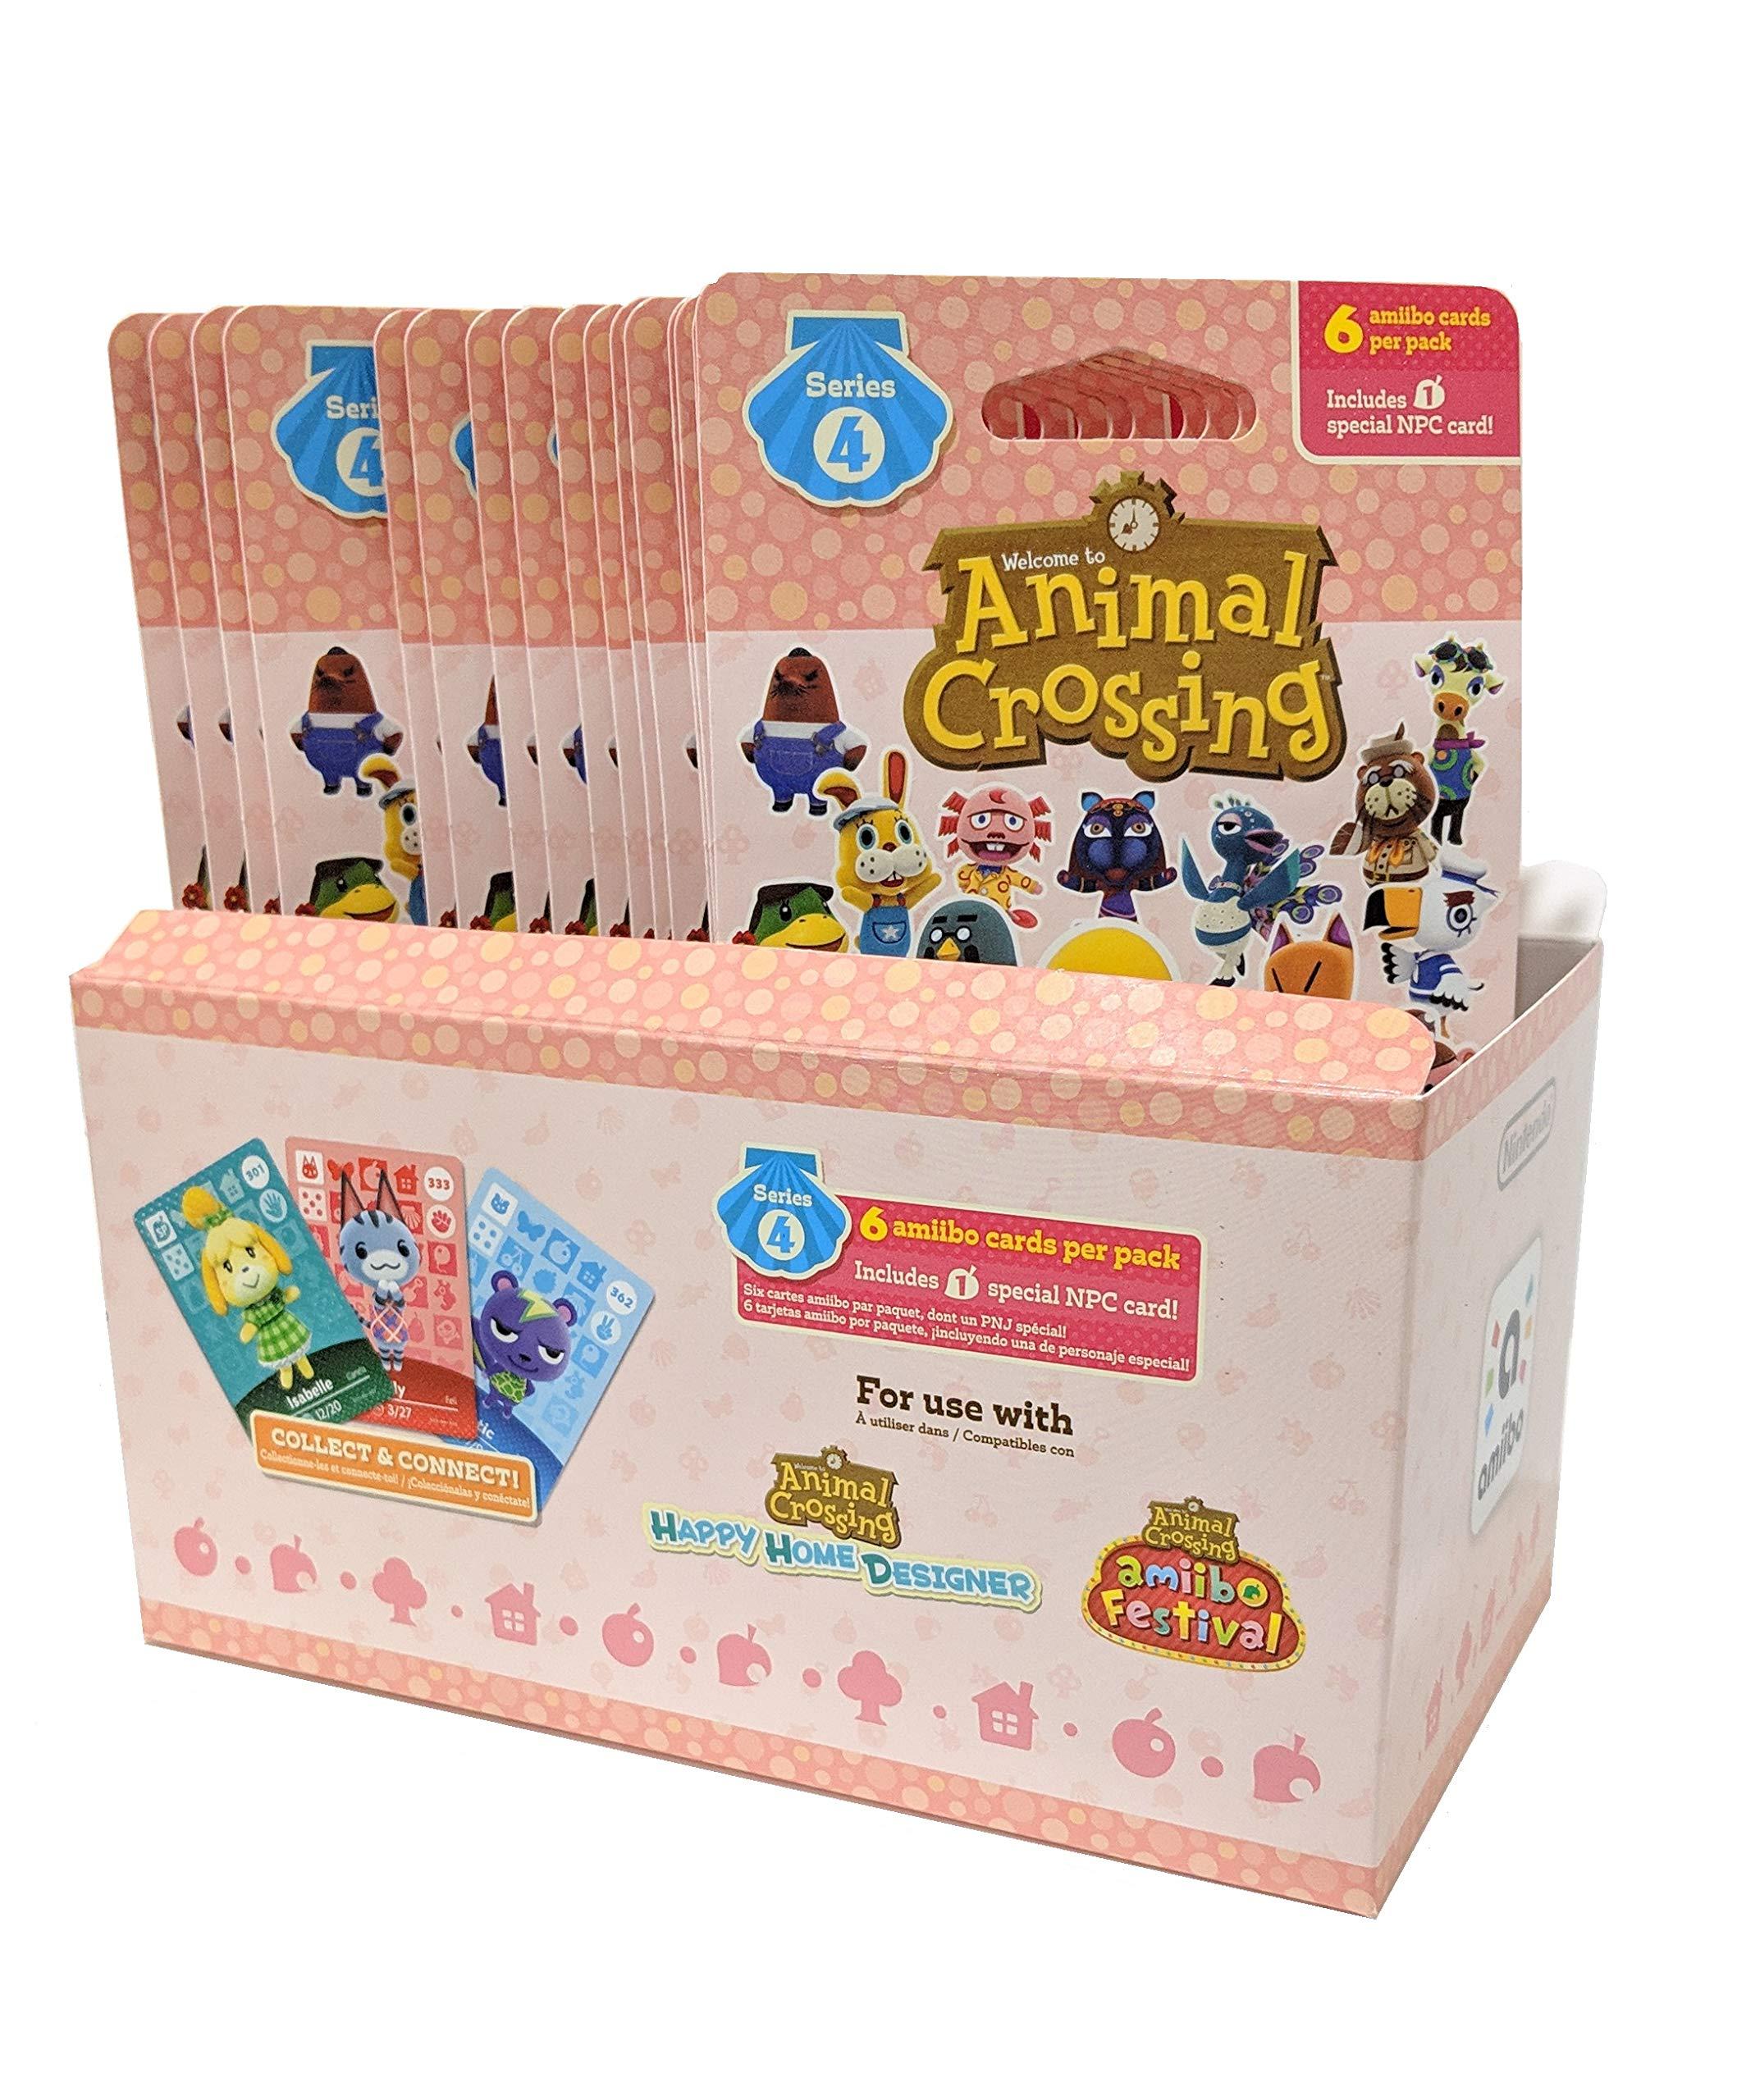 Animal Crossing Amiibo Cards Series 4 – Full box (18 Packs) (6 Cards Per Pack/108 Cards) …